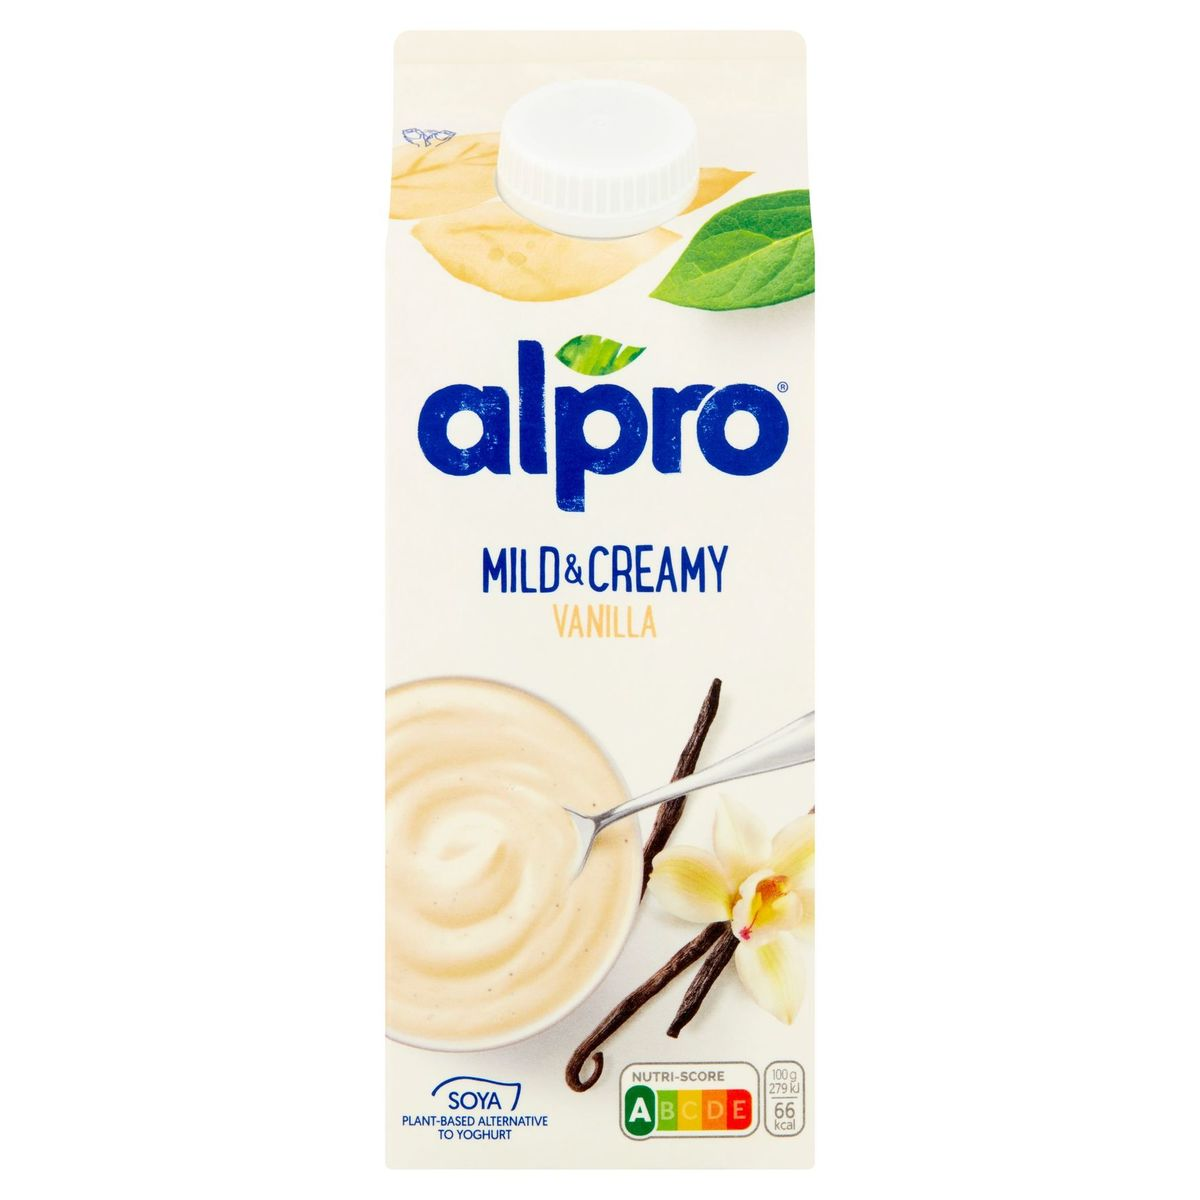 Alpro Mild & Creamy Vanilla Soya 750 g